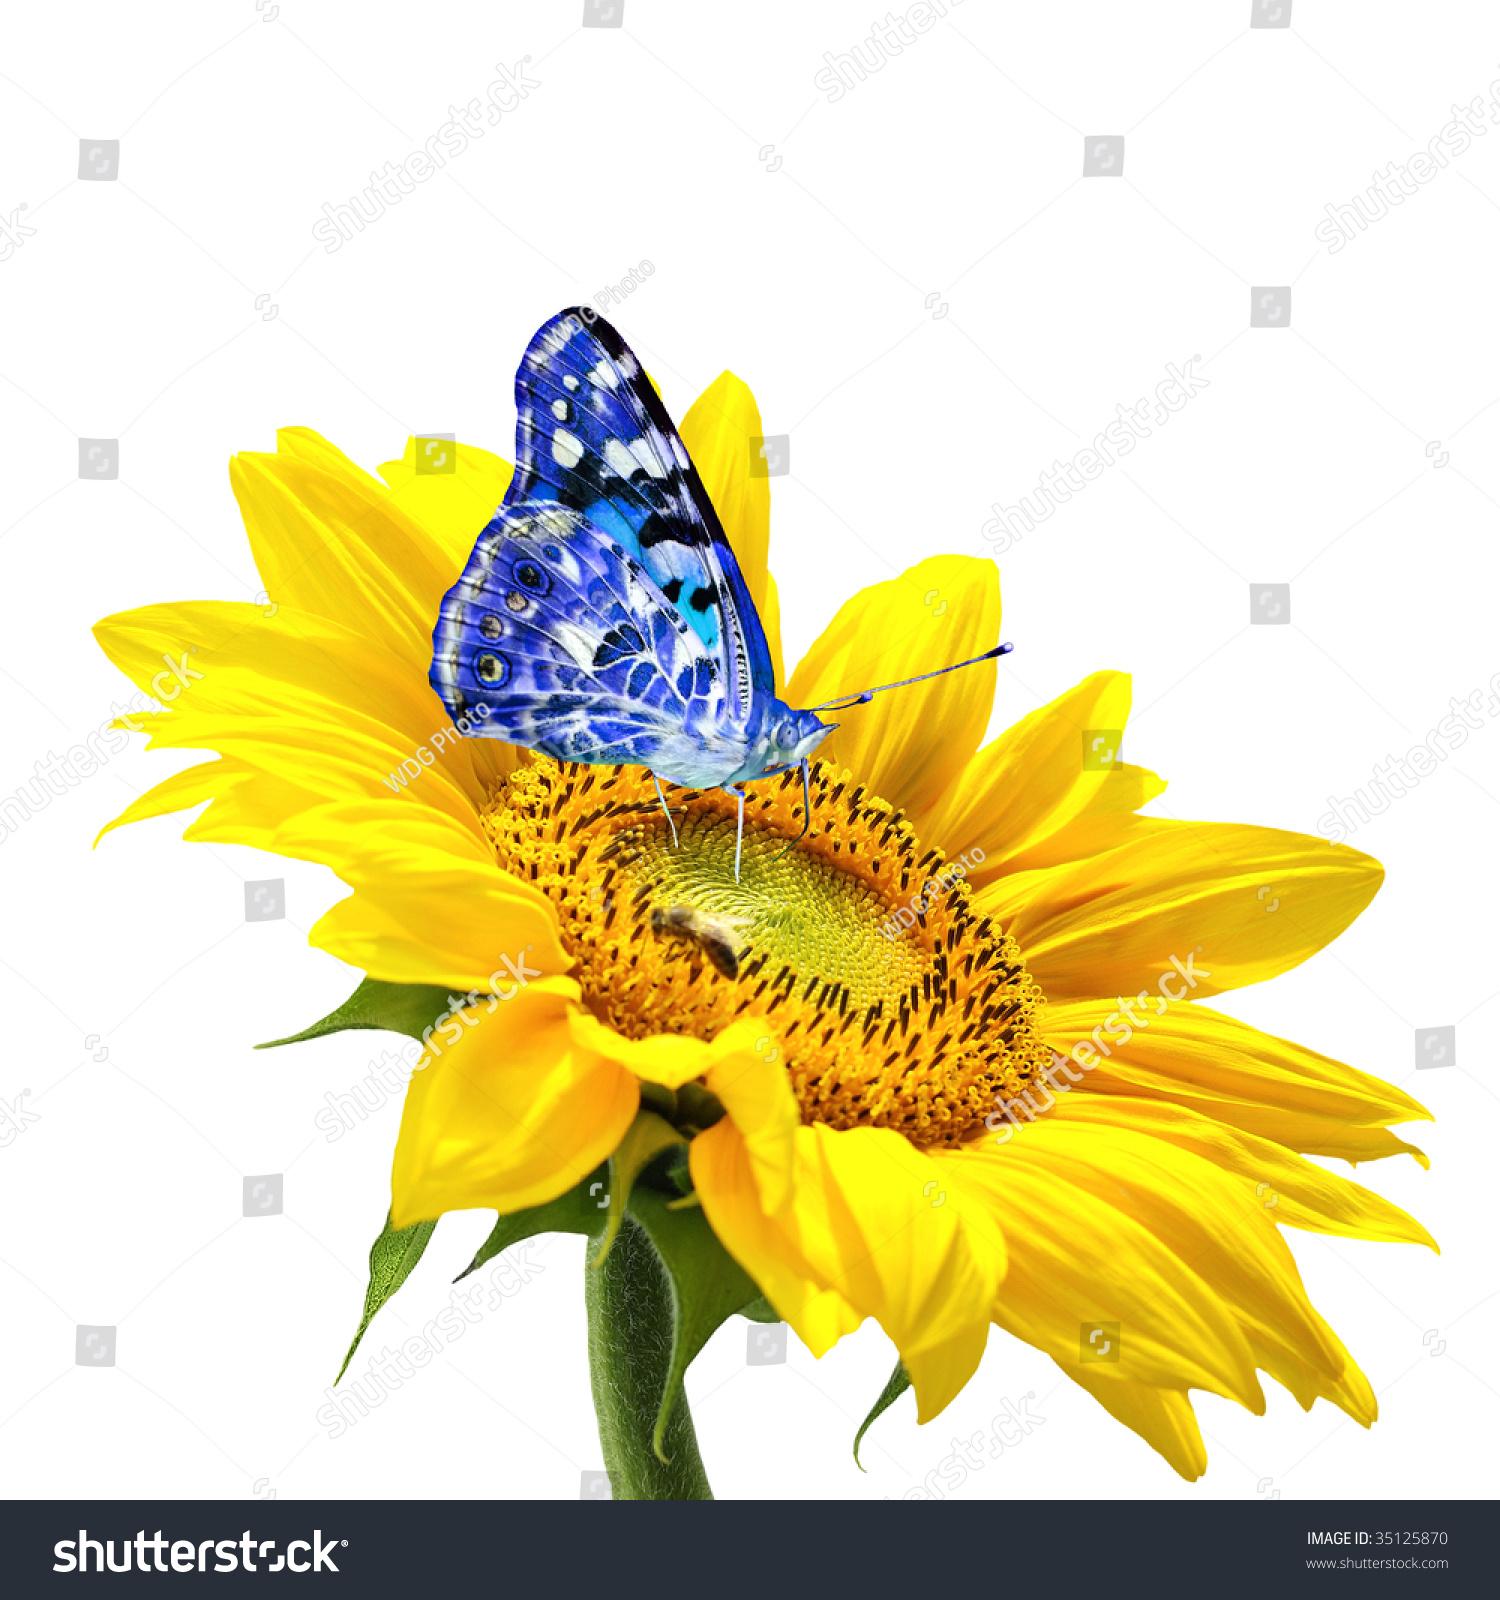 Sunflower Blue Butterfly Stock Photo 35125870 - Shutterstock